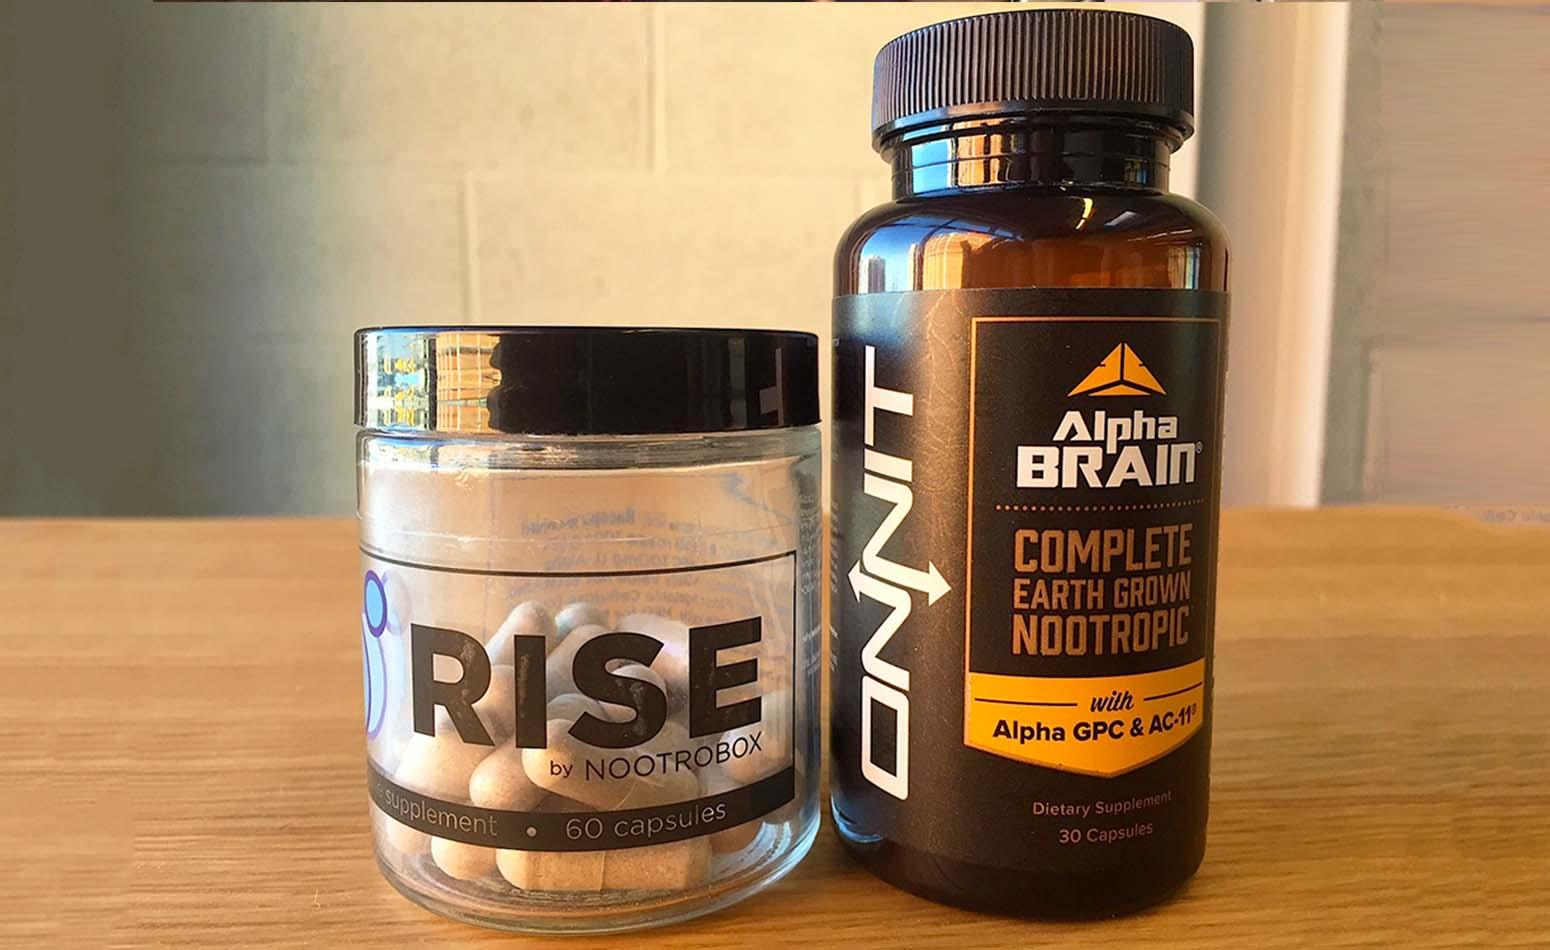 Alpha Brain Review Reddit - Biosciencenutra